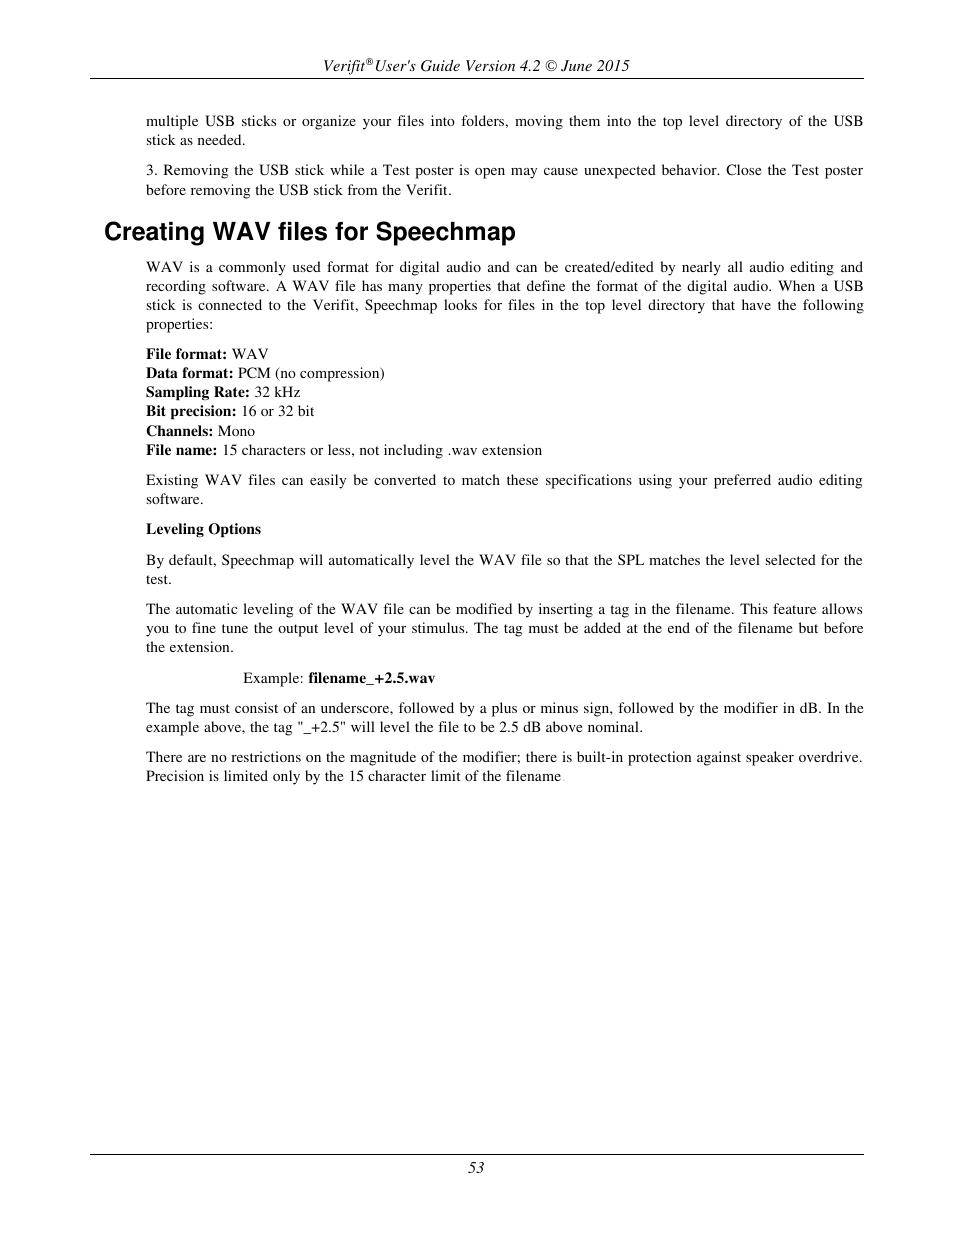 Creating wav files for speechmap | Audioscan Verifit 2 User